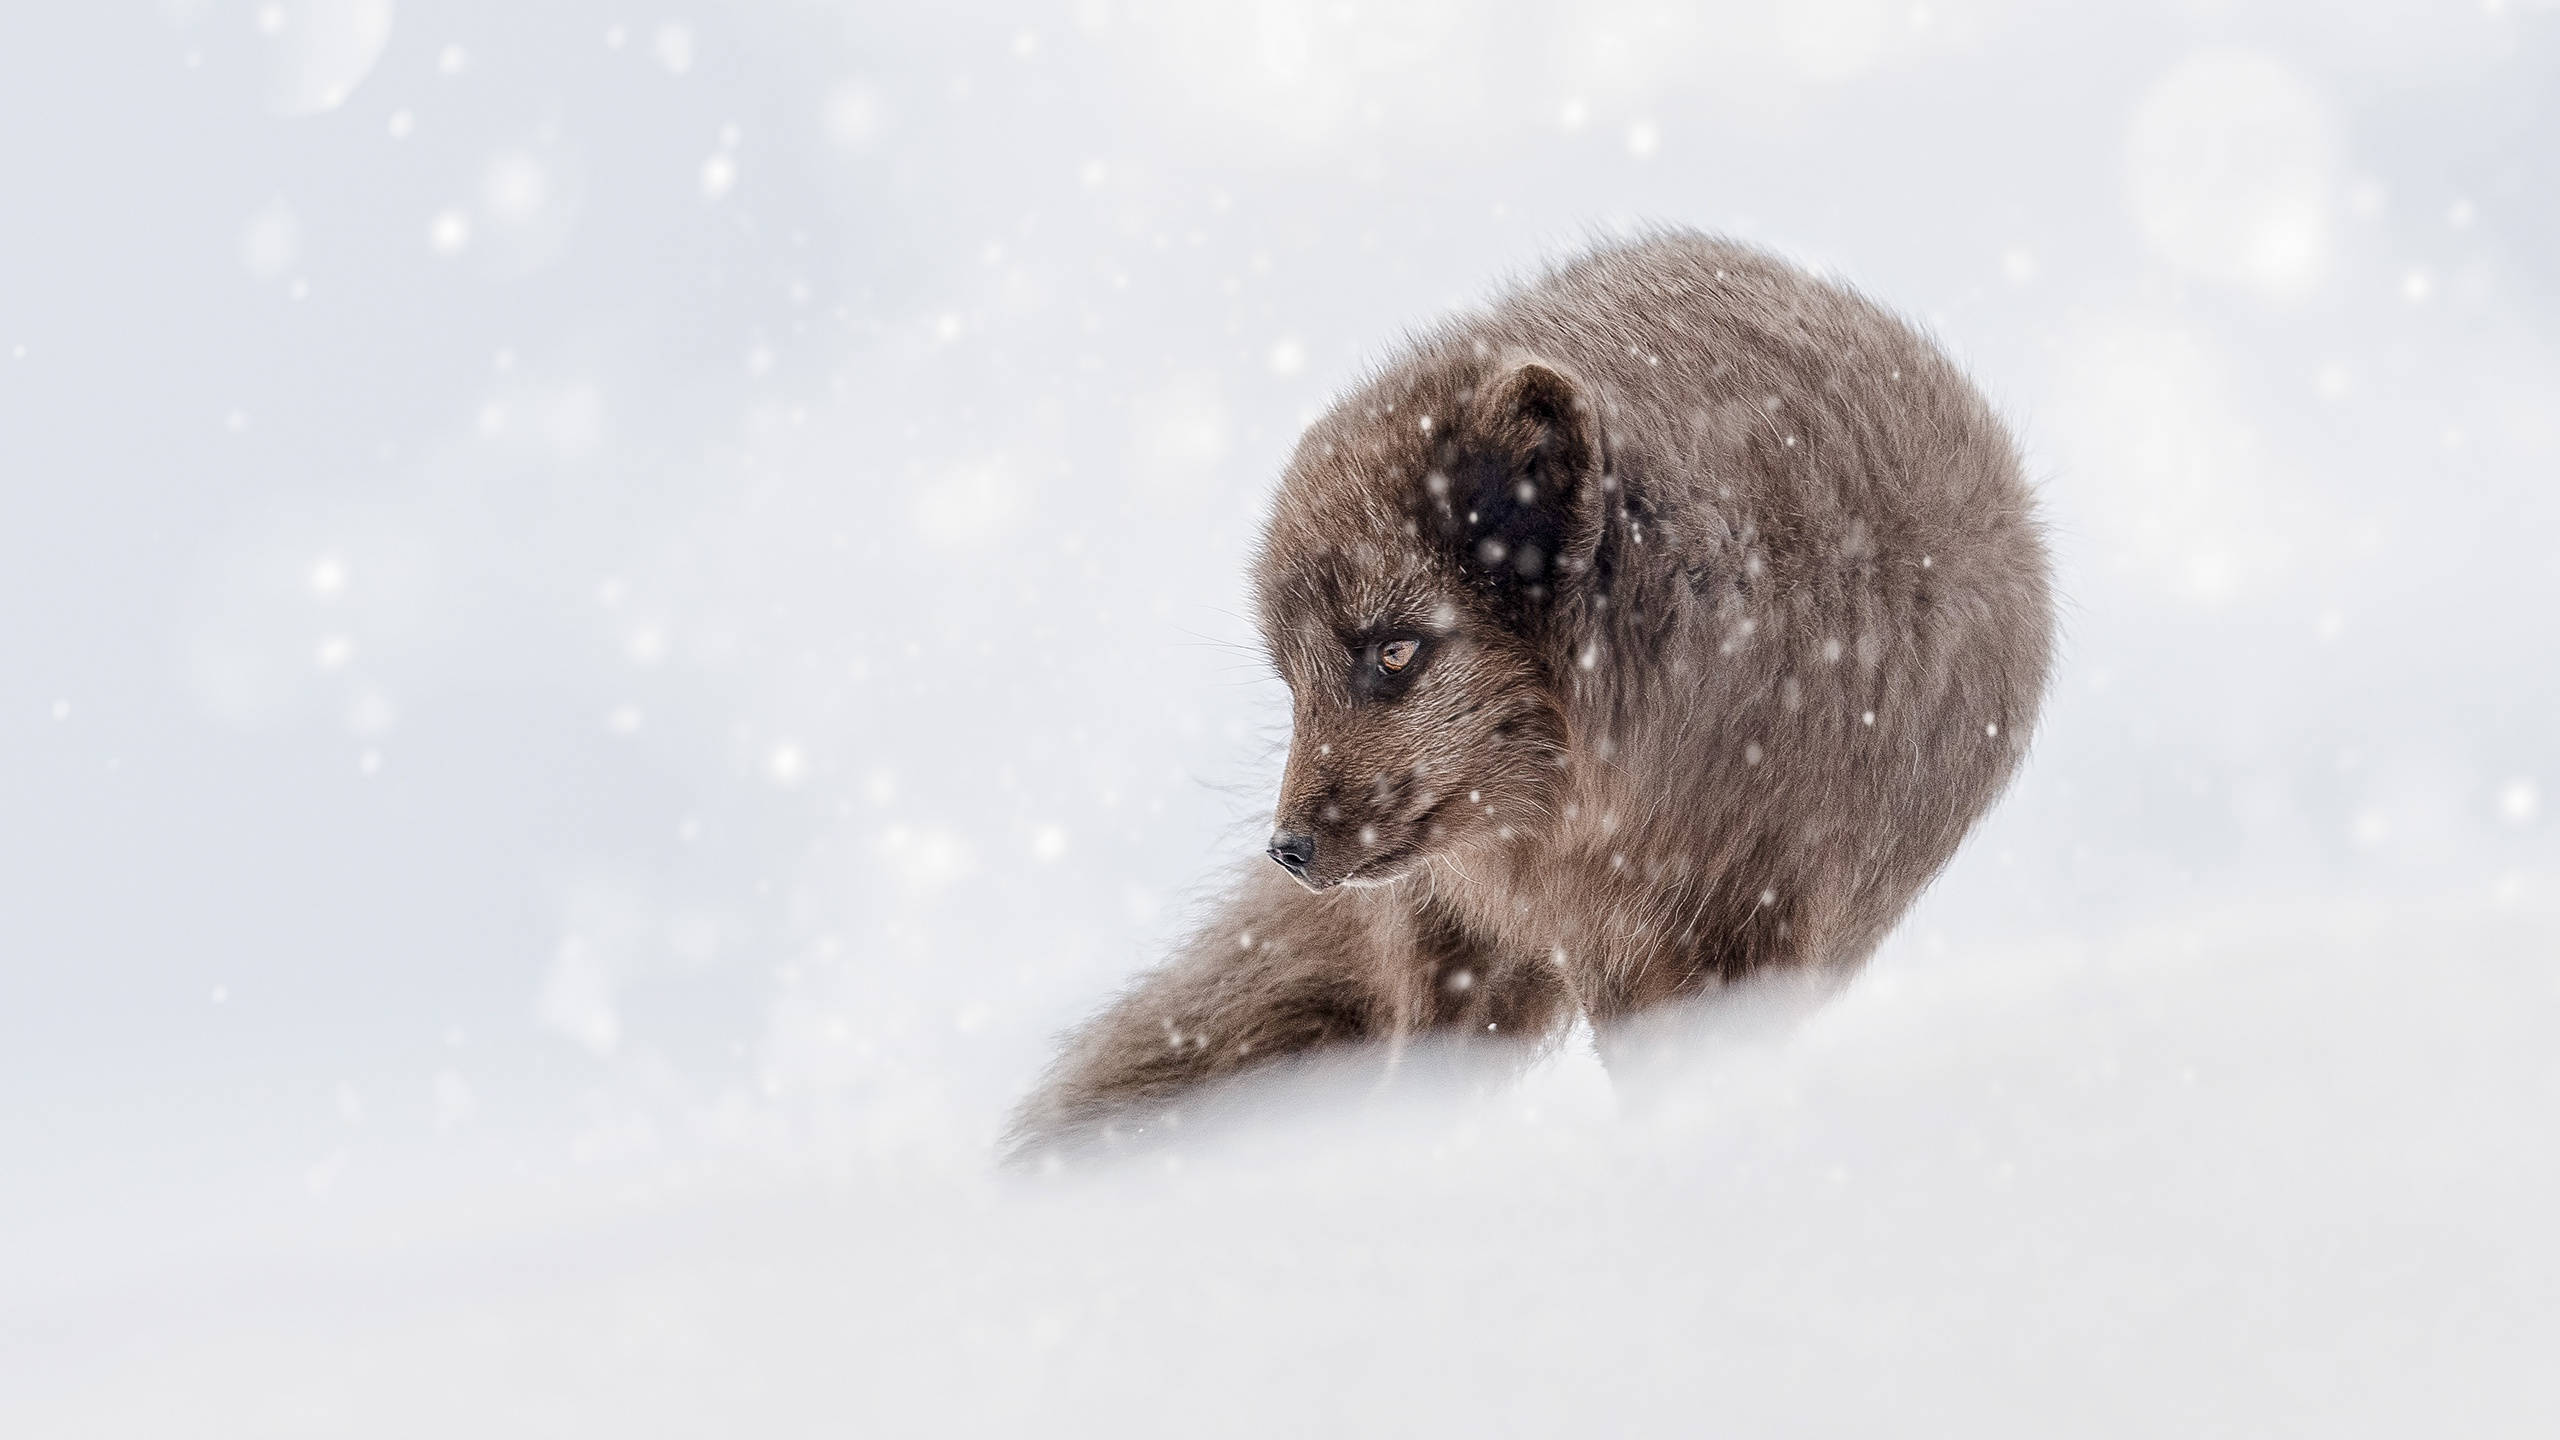 Fox Snow Snowfall Wildlife Winter 2560x1440